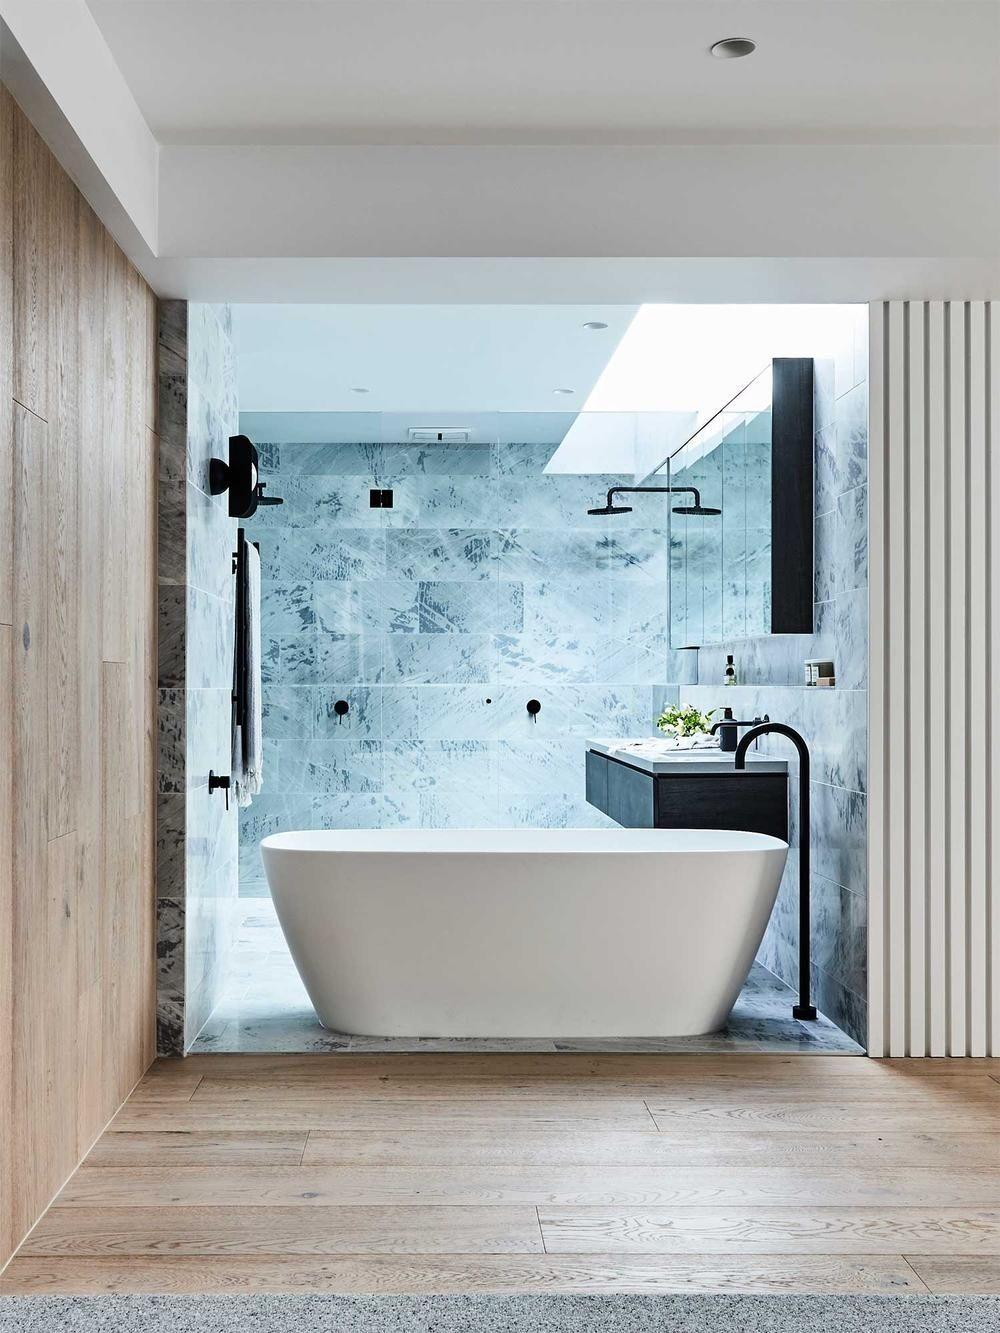 Beautiful The 12 Perfect Bathroom Ideas Australia 2019 Ij09kq Https Ijcar 2016 Info The 12 Perf Open Plan Bathrooms Open Plan Bathroom Design Bathroom Design